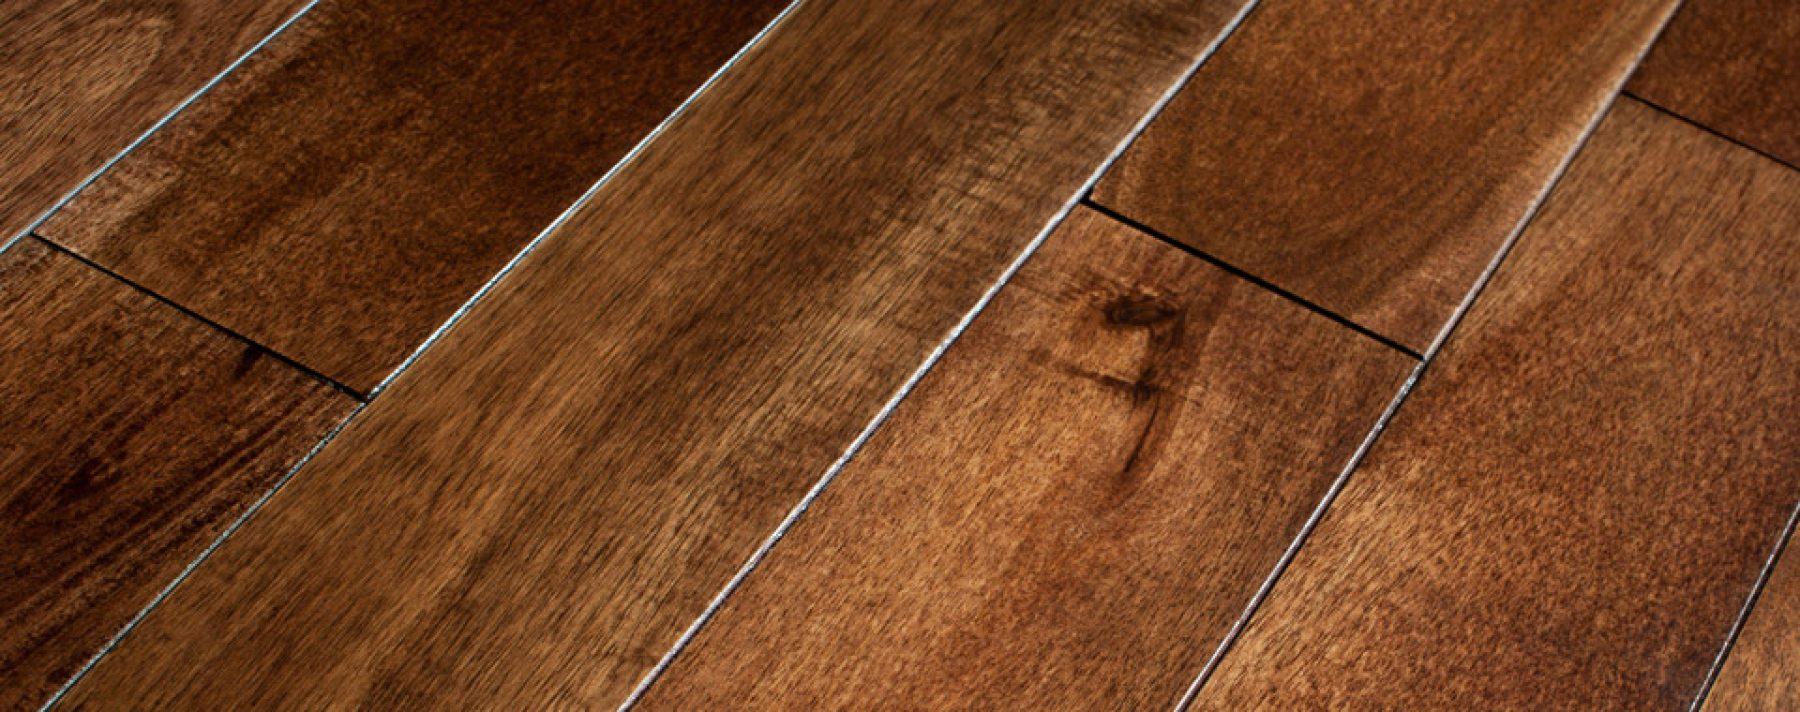 Wood Flooring Past Amp Present Wood Flooring